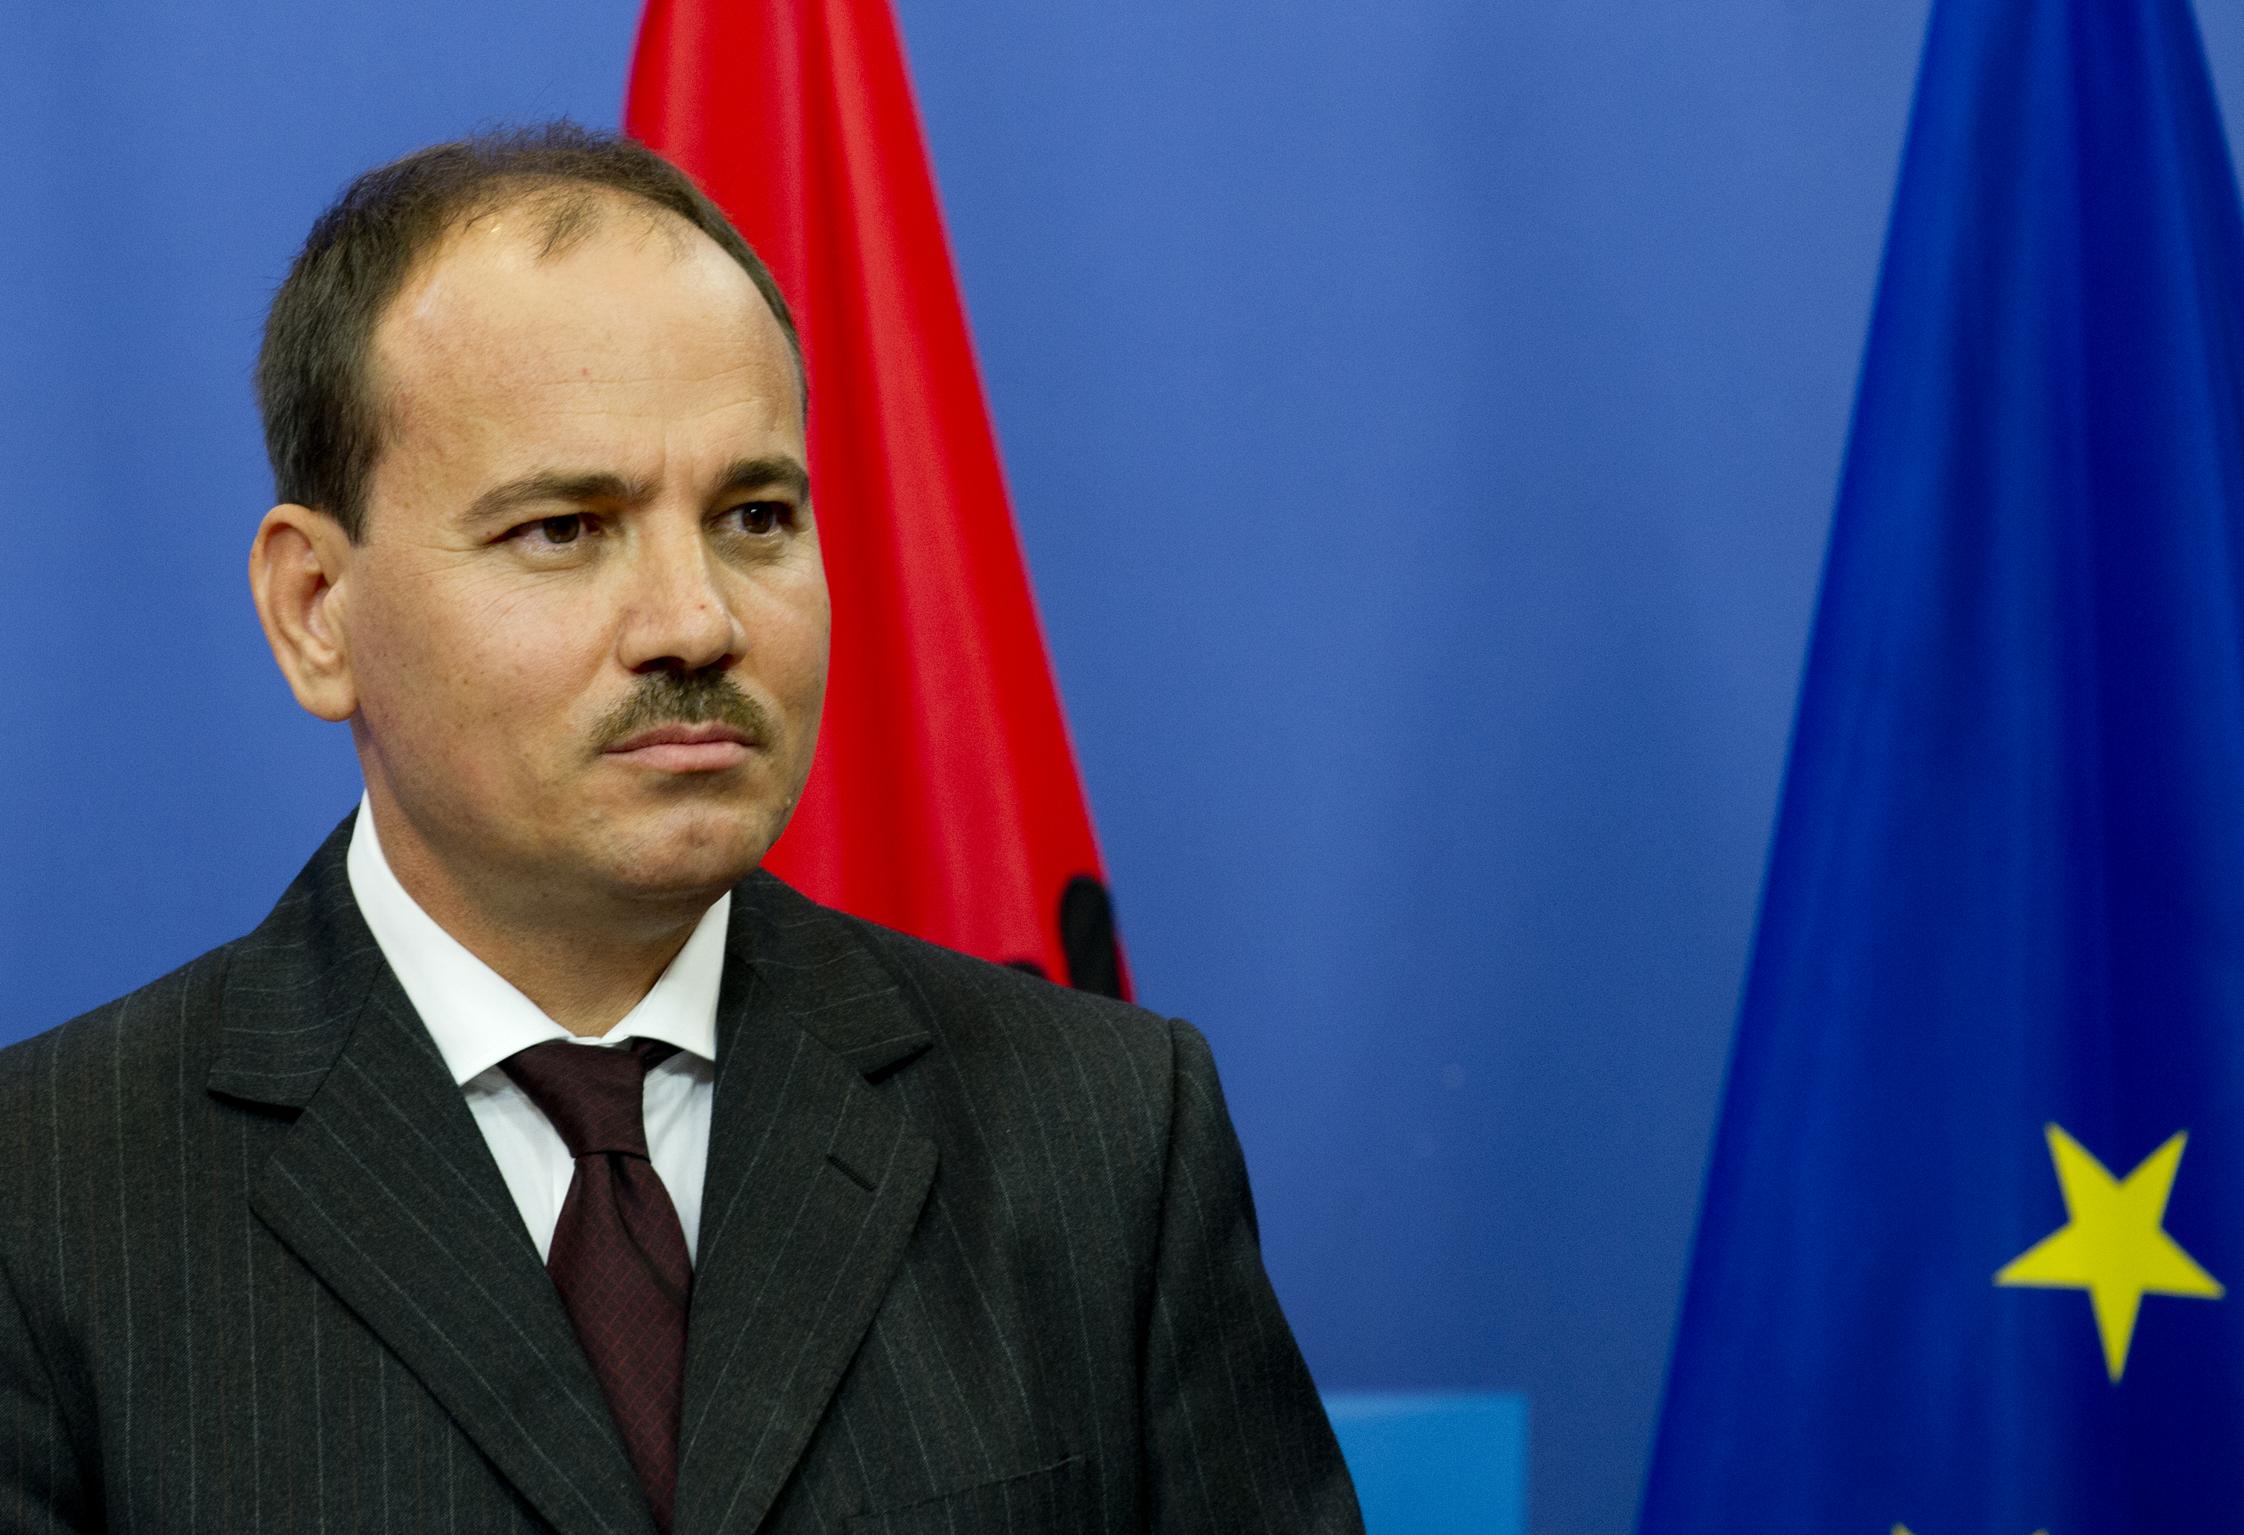 Le président albanais Bujar Nishani   Crédits photo -- The Council of the European Union